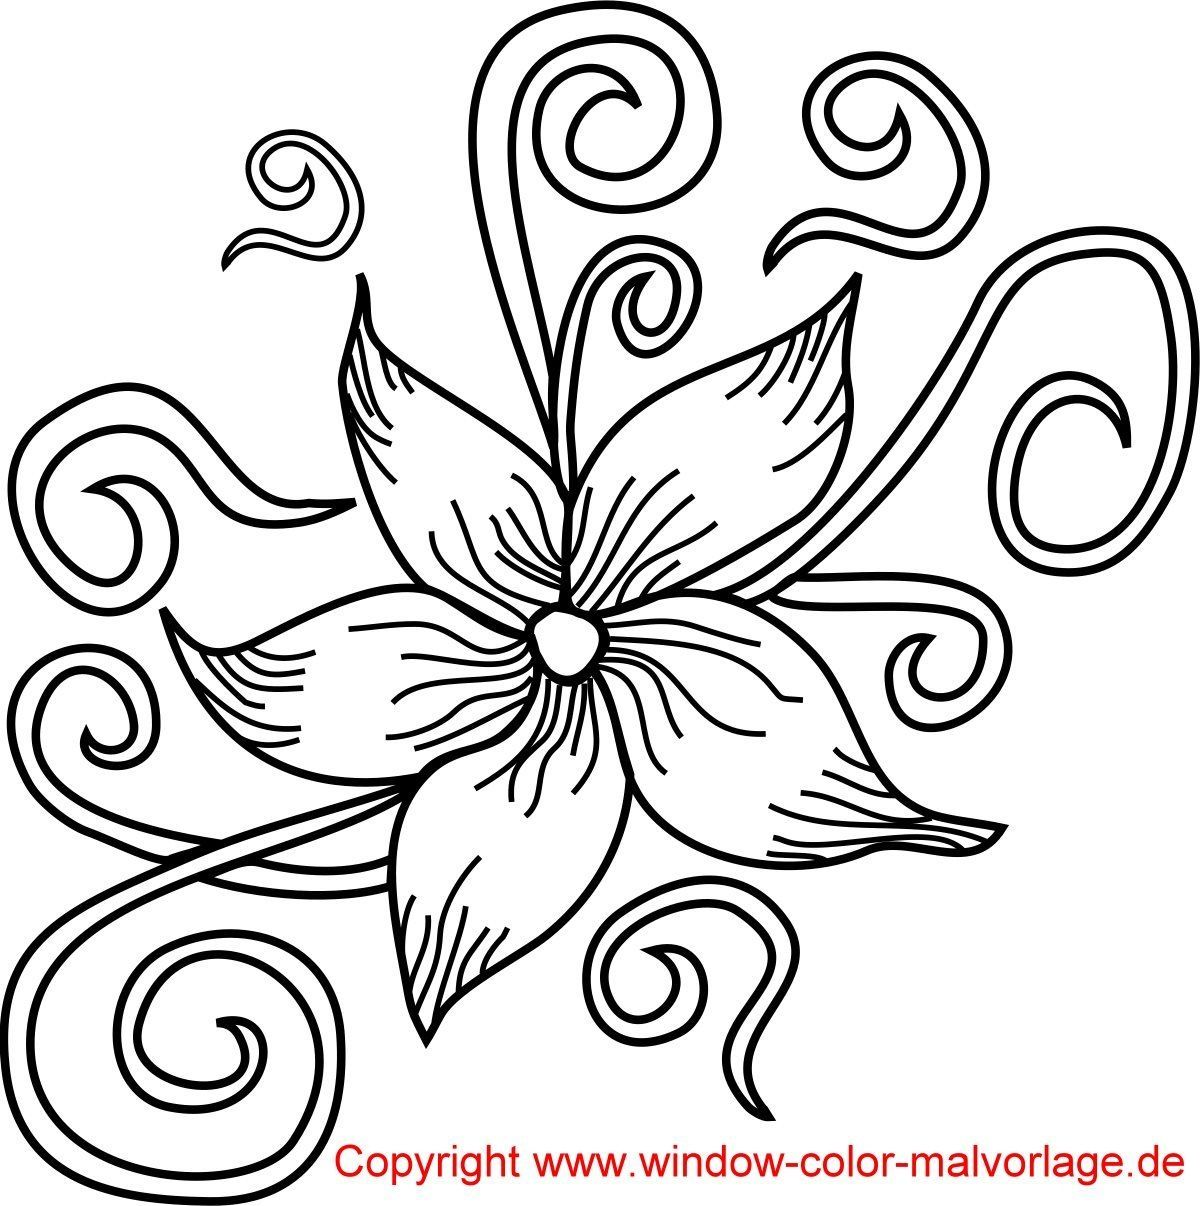 Malvorlagen Blumen Ranken Seni